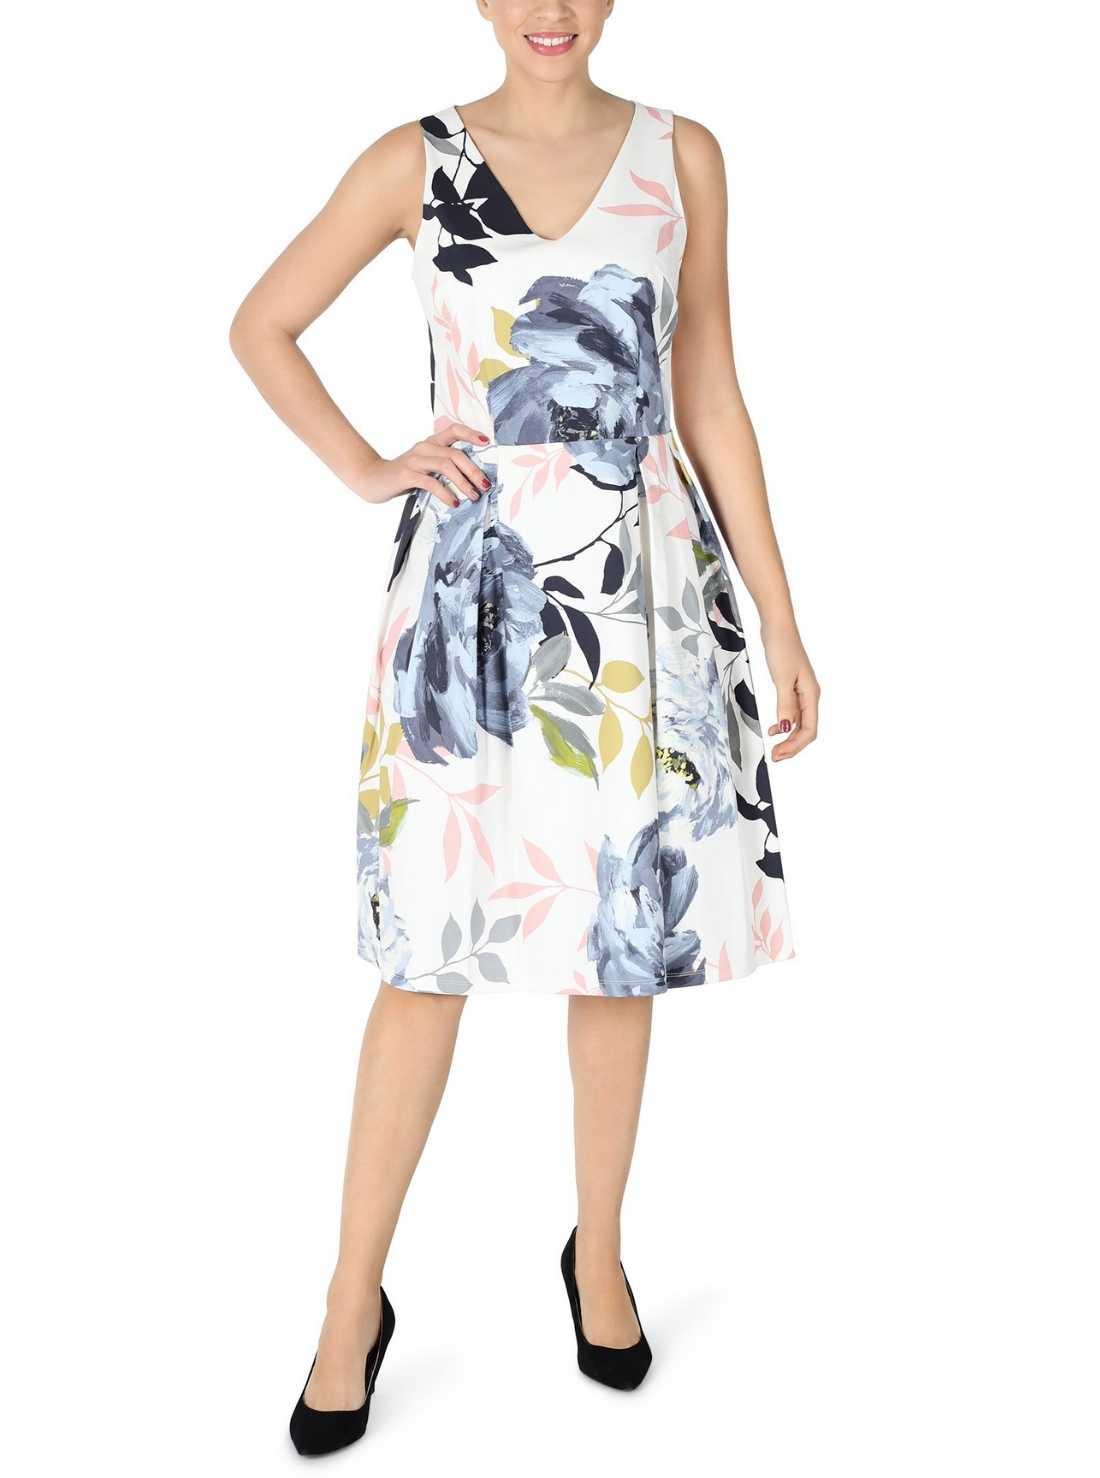 Wholesale Printed Sleeveless Cotton Dress